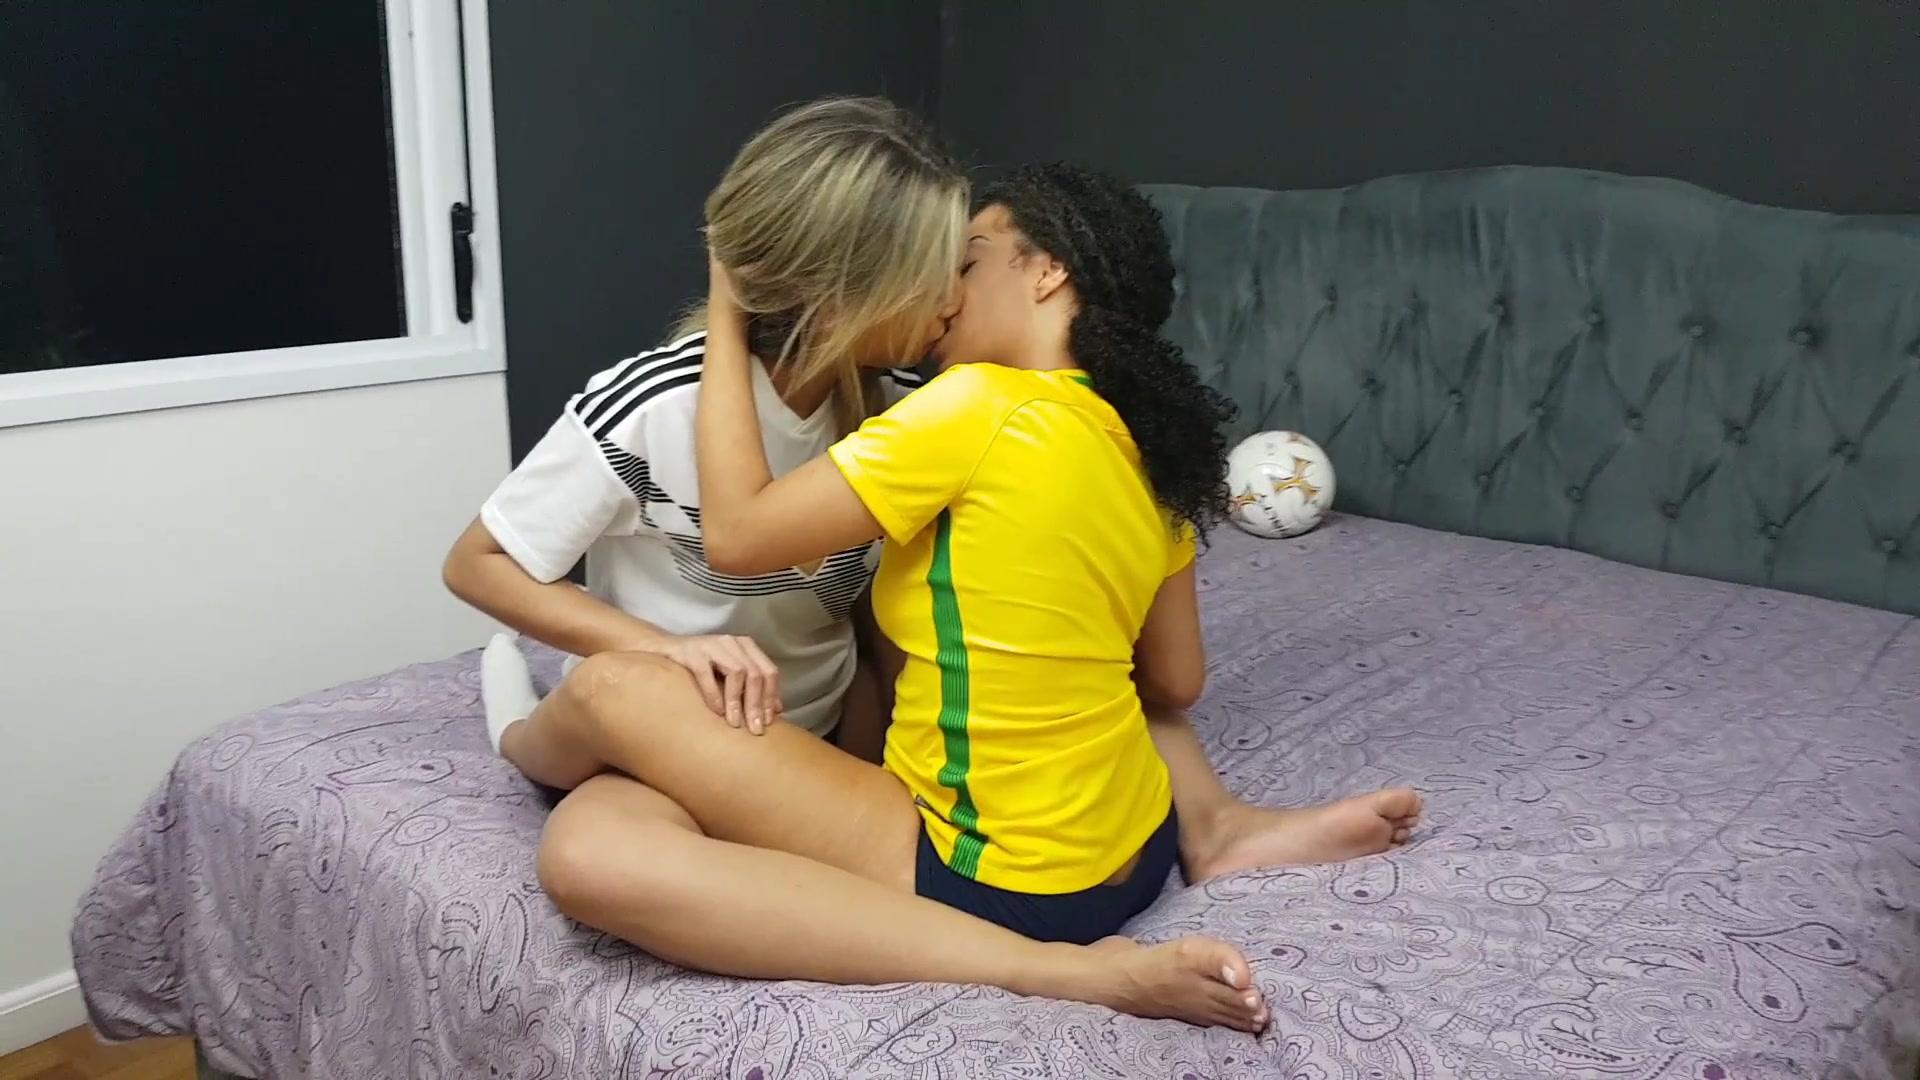 Erotic Brazilian Kisses